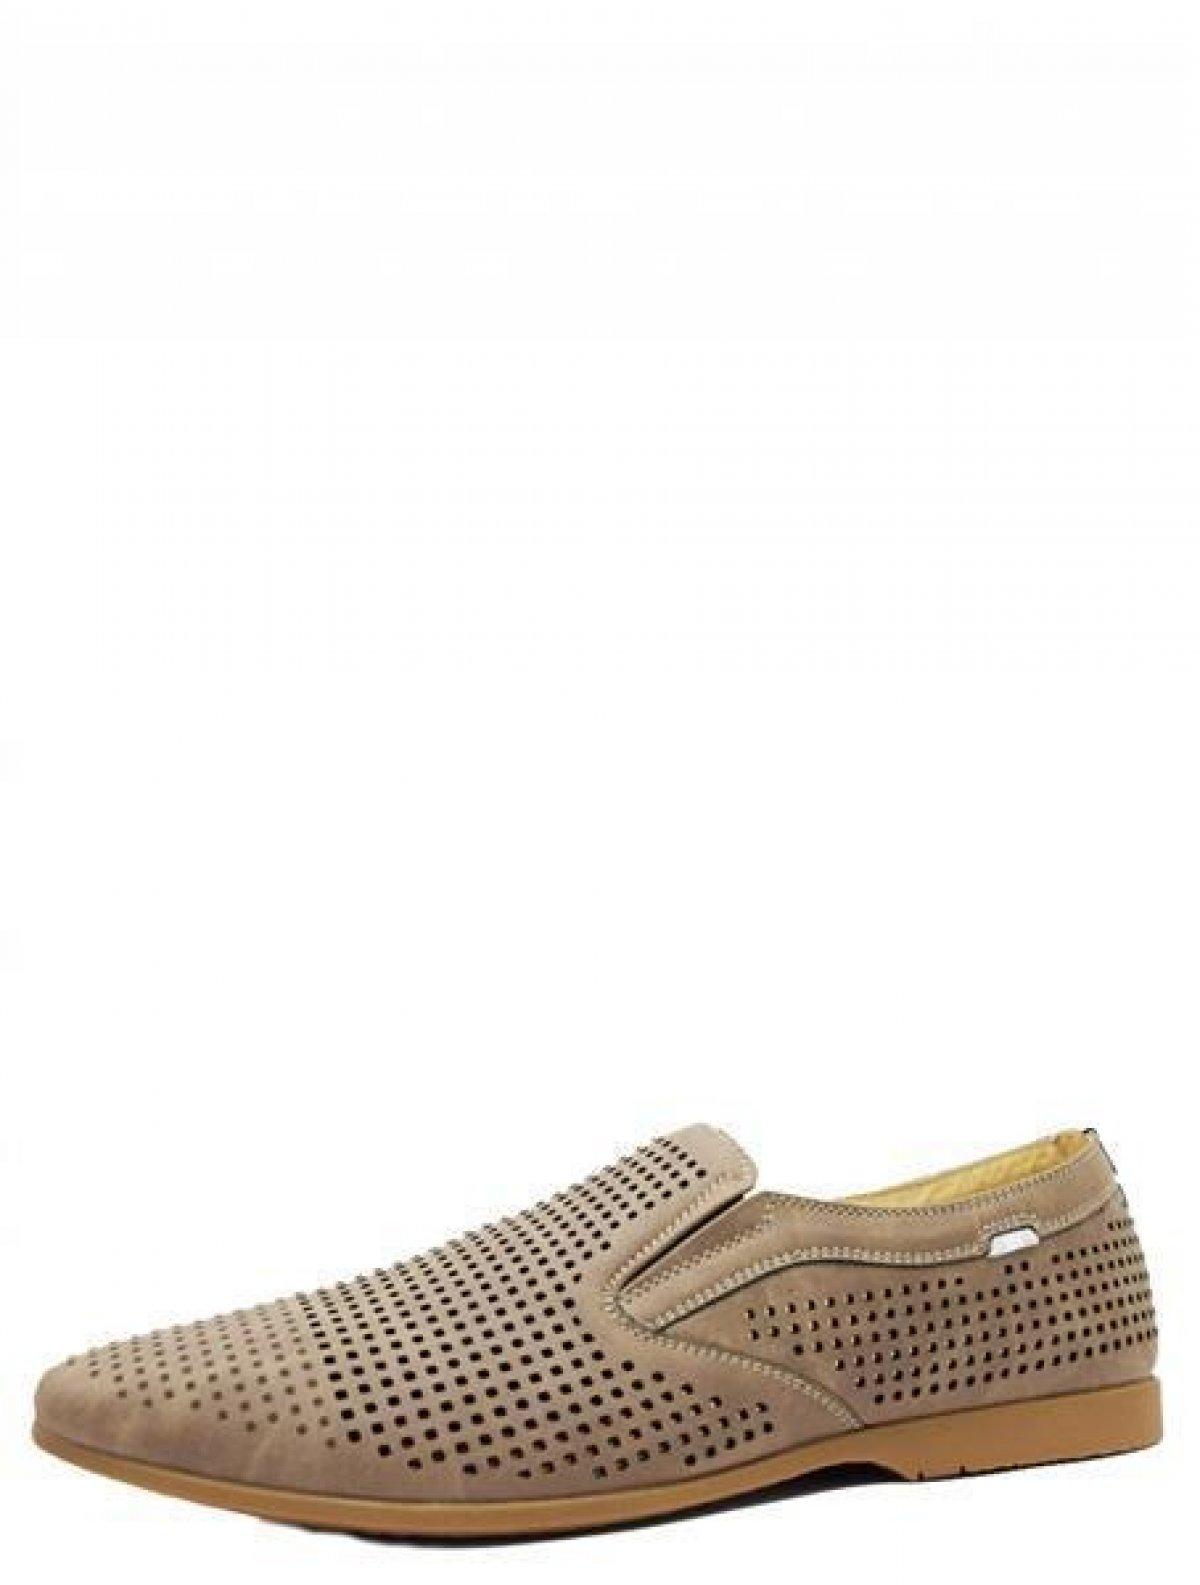 1626-YM50331E туфли мужские